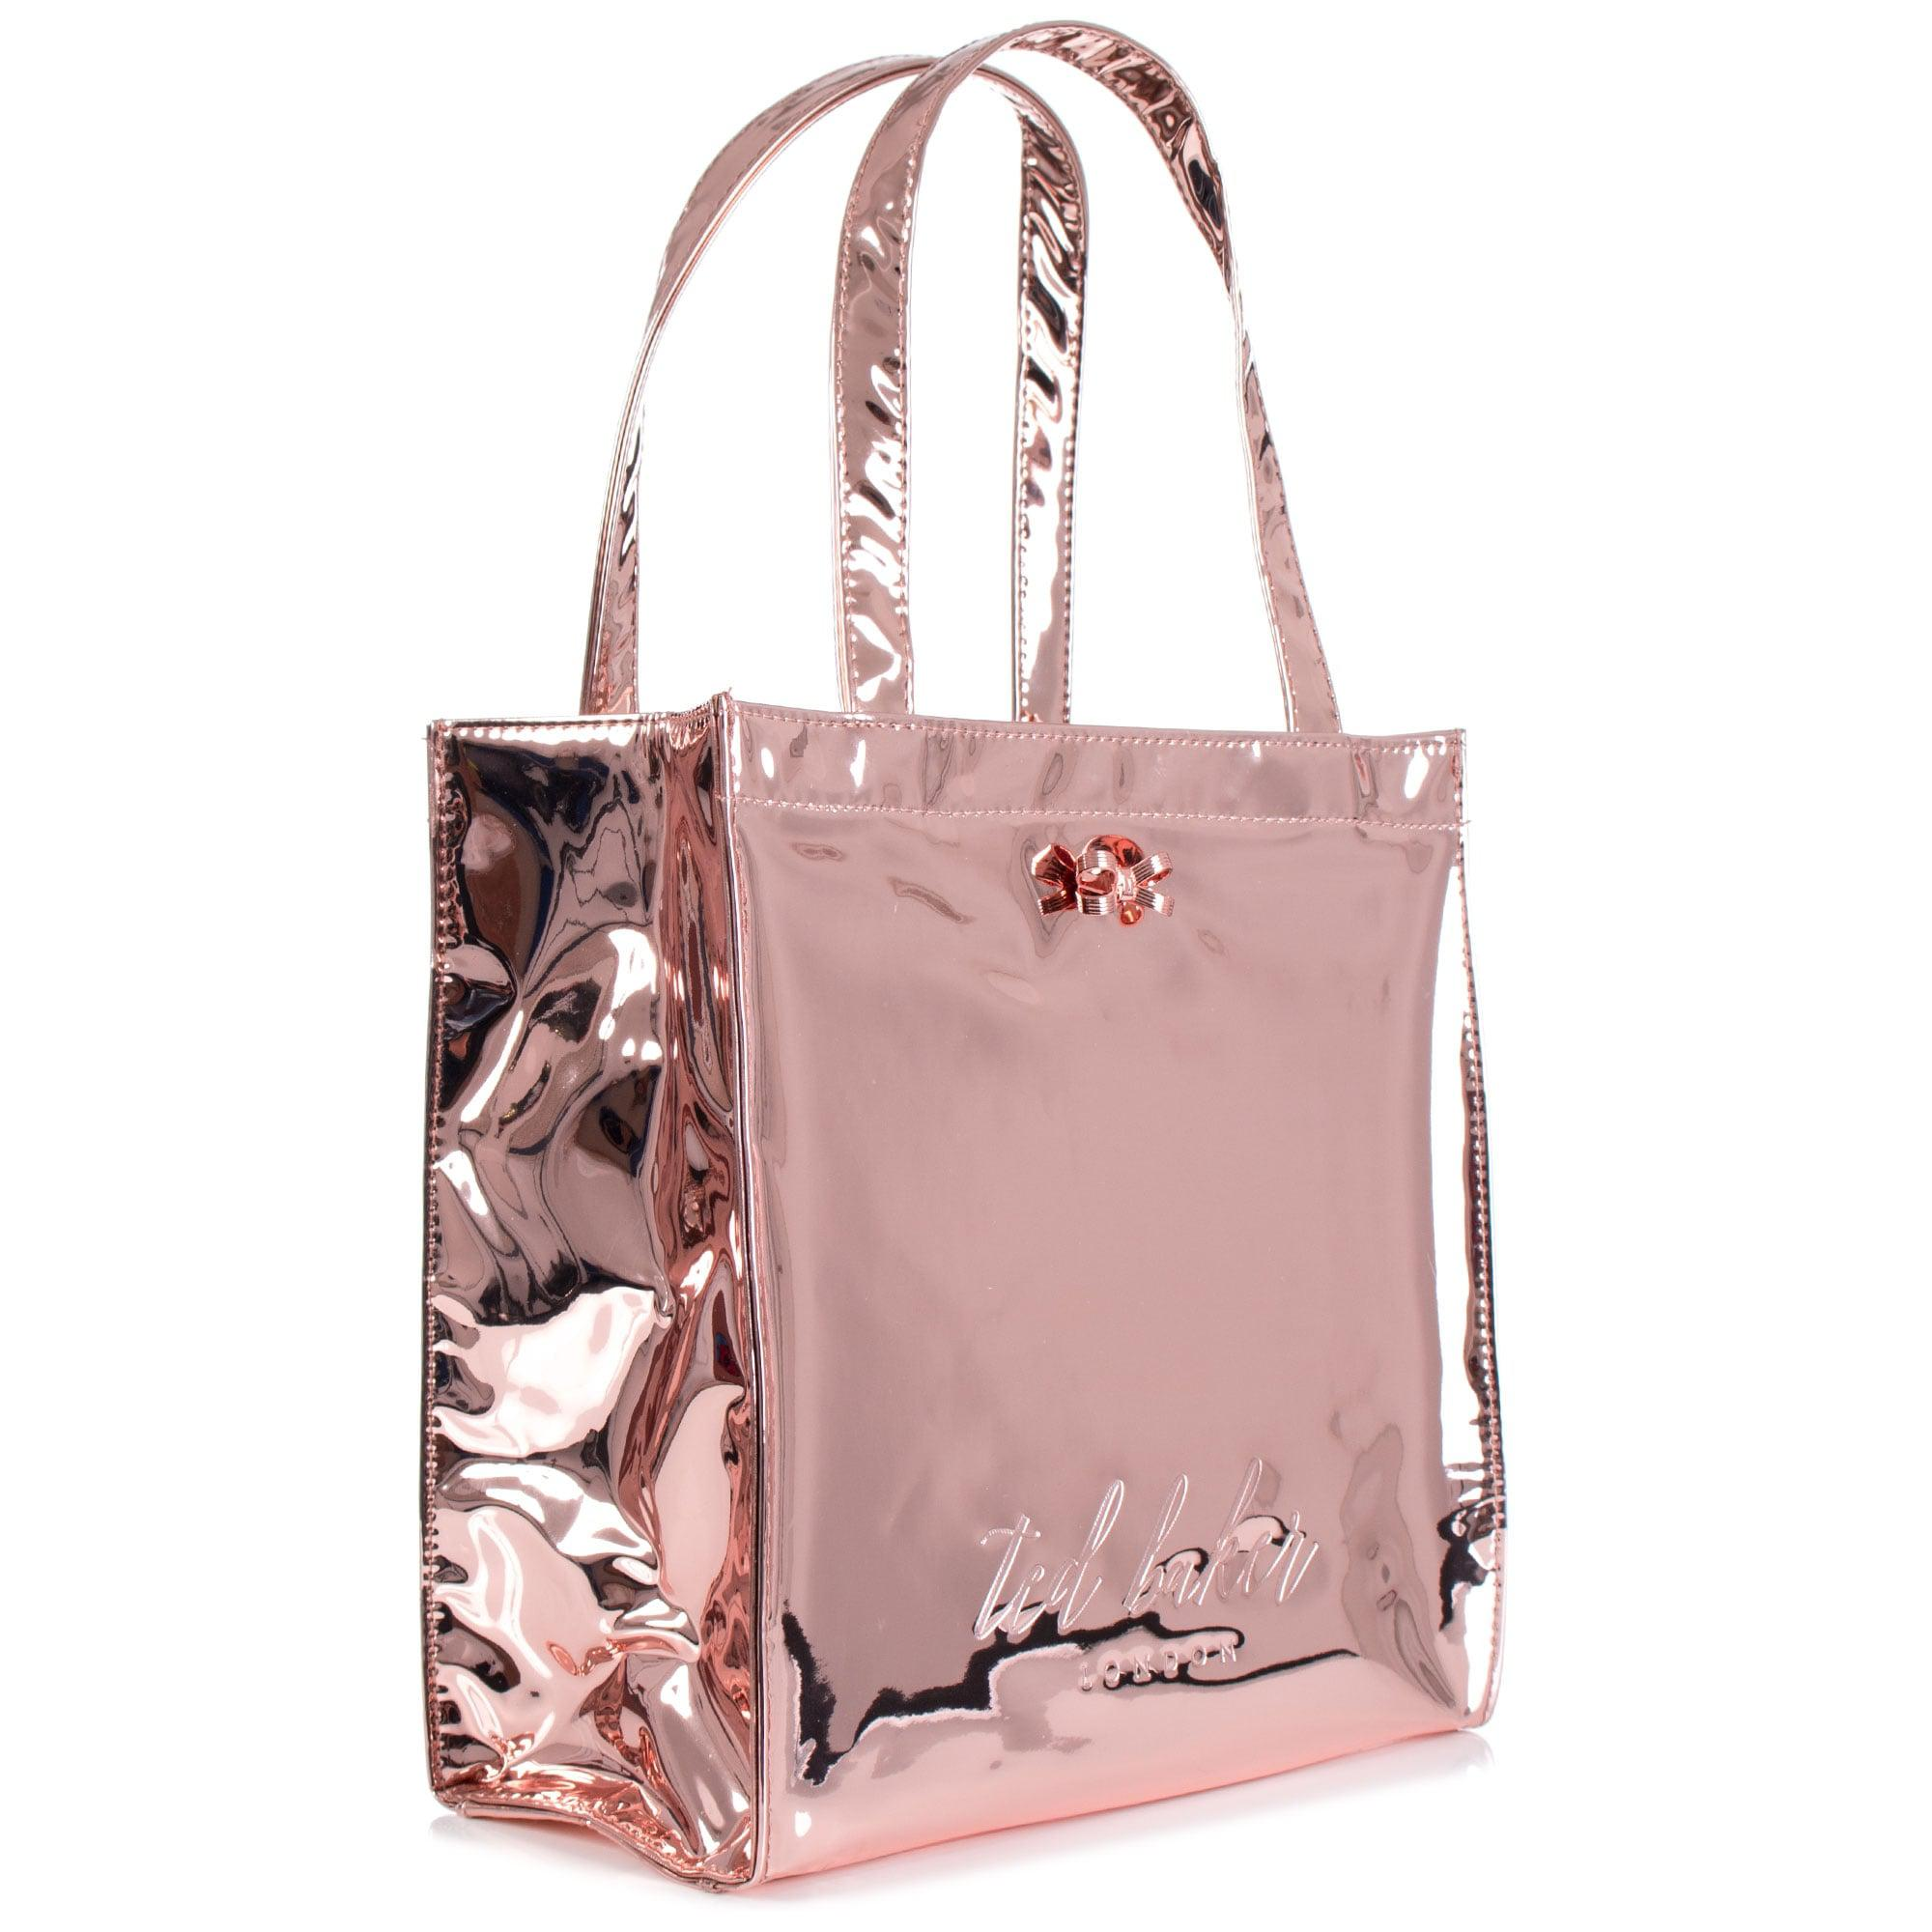 6c09ec84c Ted Baker Doracon Small Shopper in Pink - Lyst